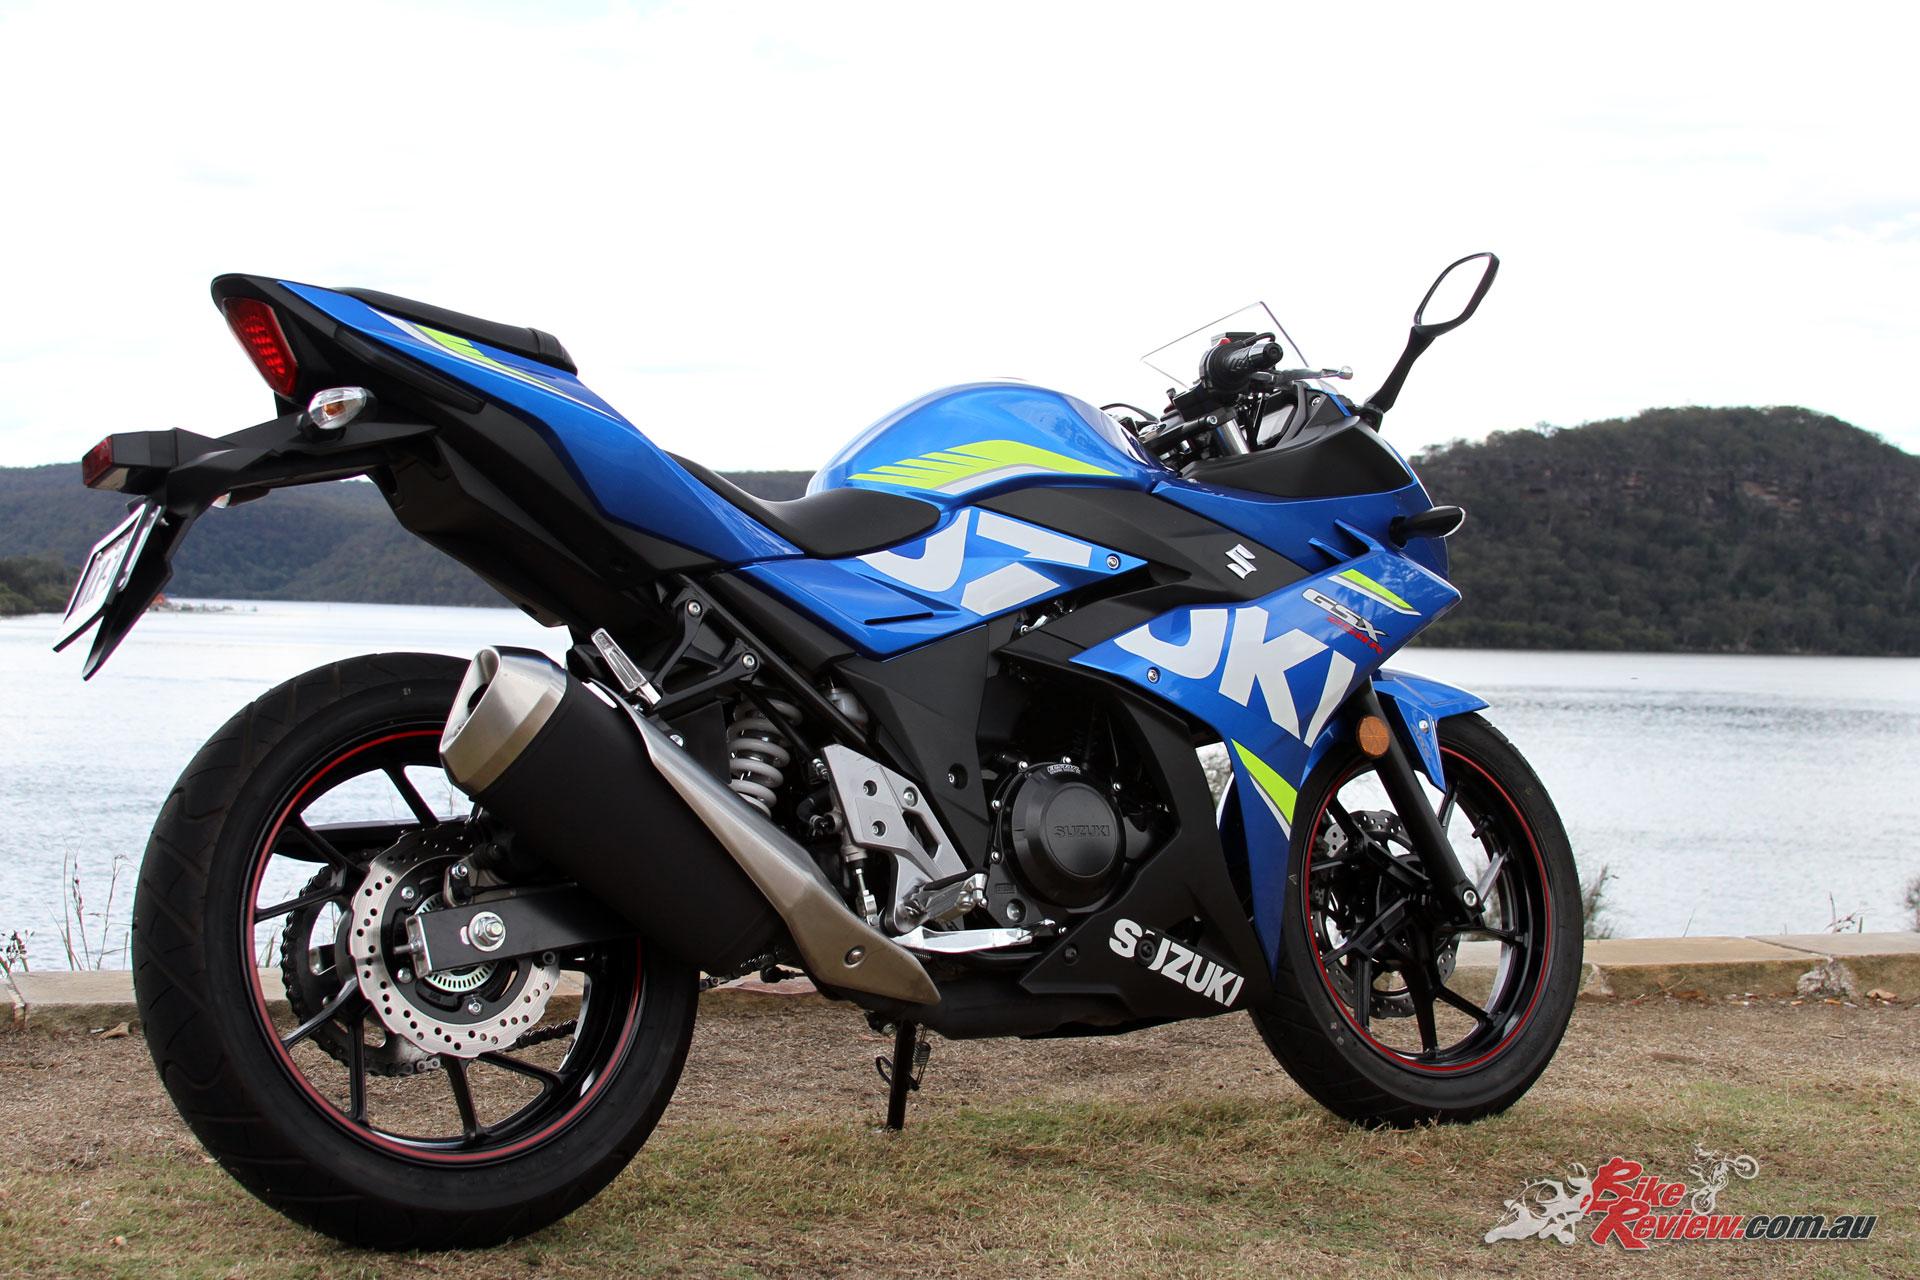 The GSX250R offers nakedbike ergonomics, a confidence inspiring CoG and enough performance for Australian roads.